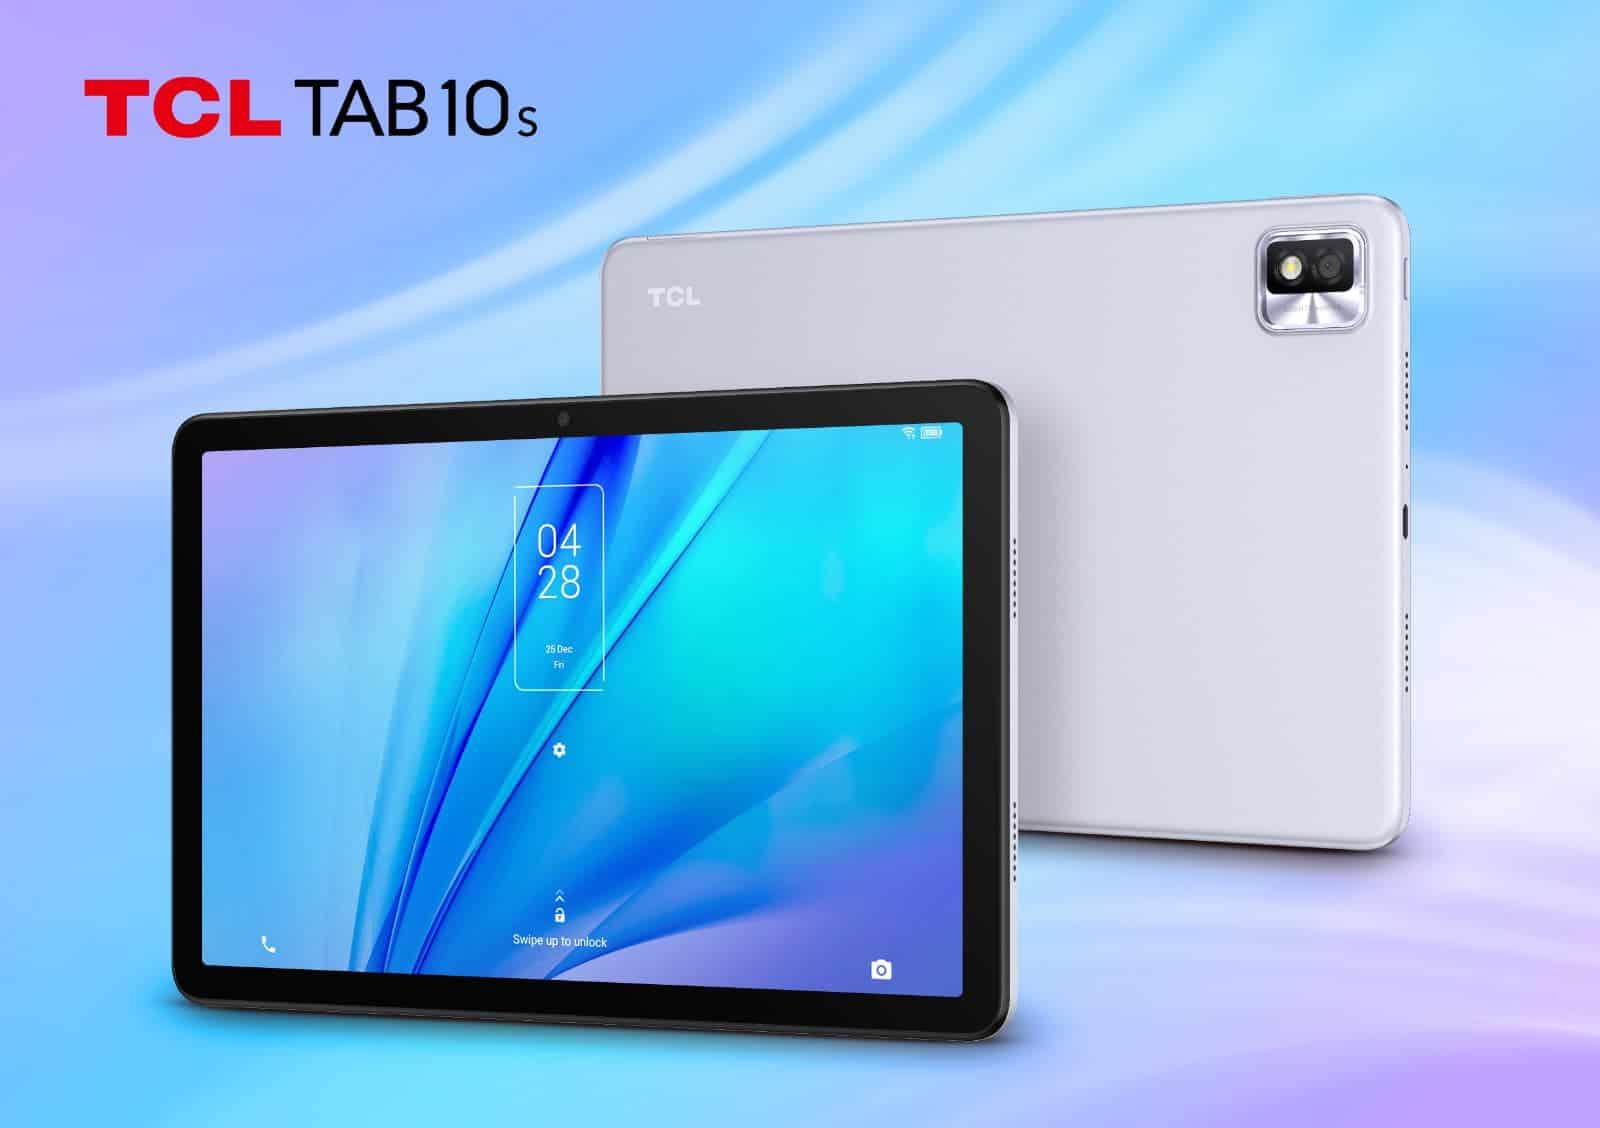 02 TCL NXTPAPER Tablets CES 2021 presser TCL TAB 10S V2 01